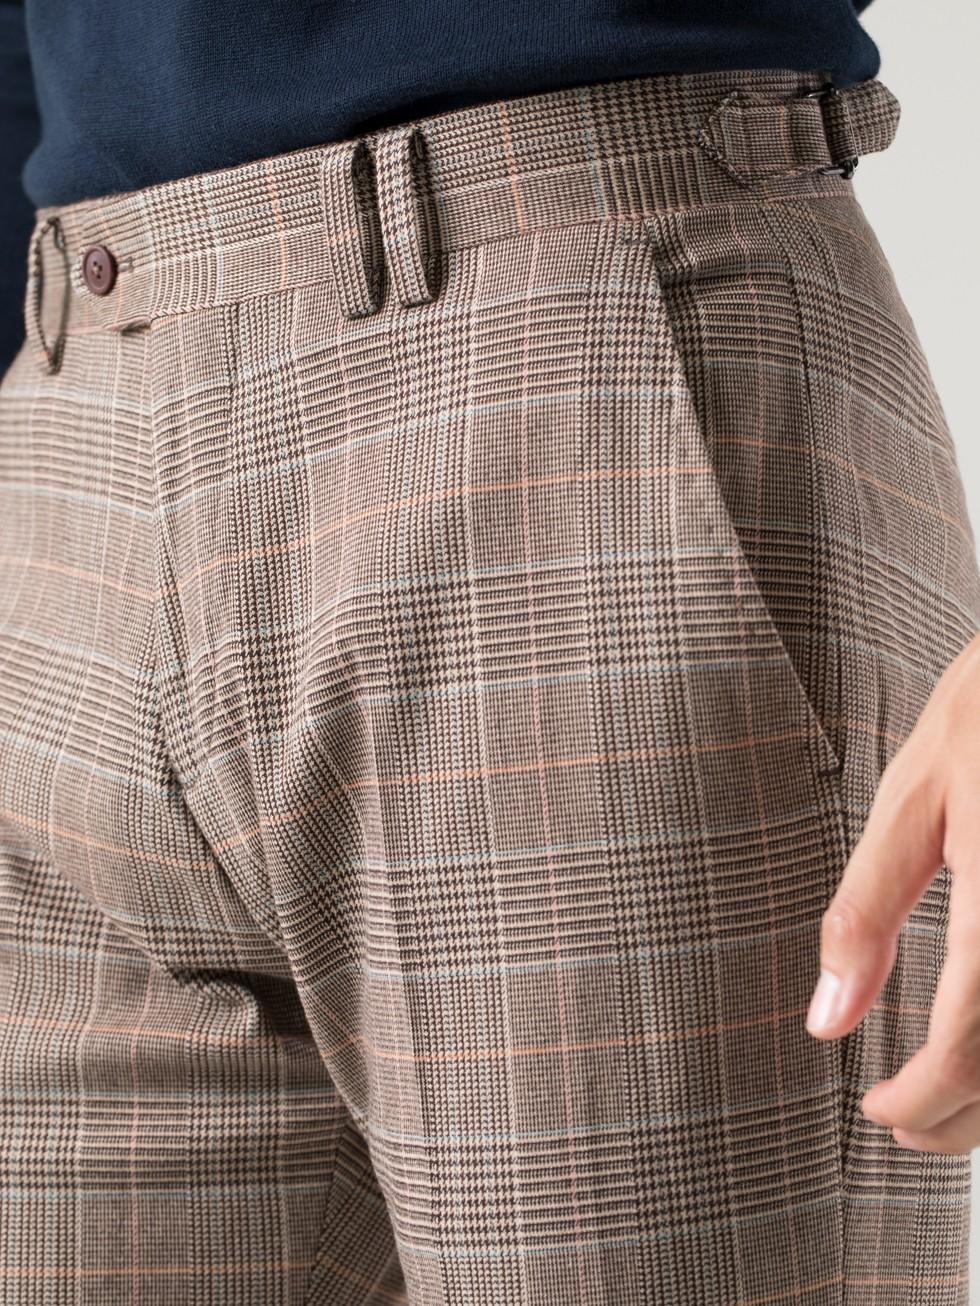 Pantalón tailored cuadro gales beige